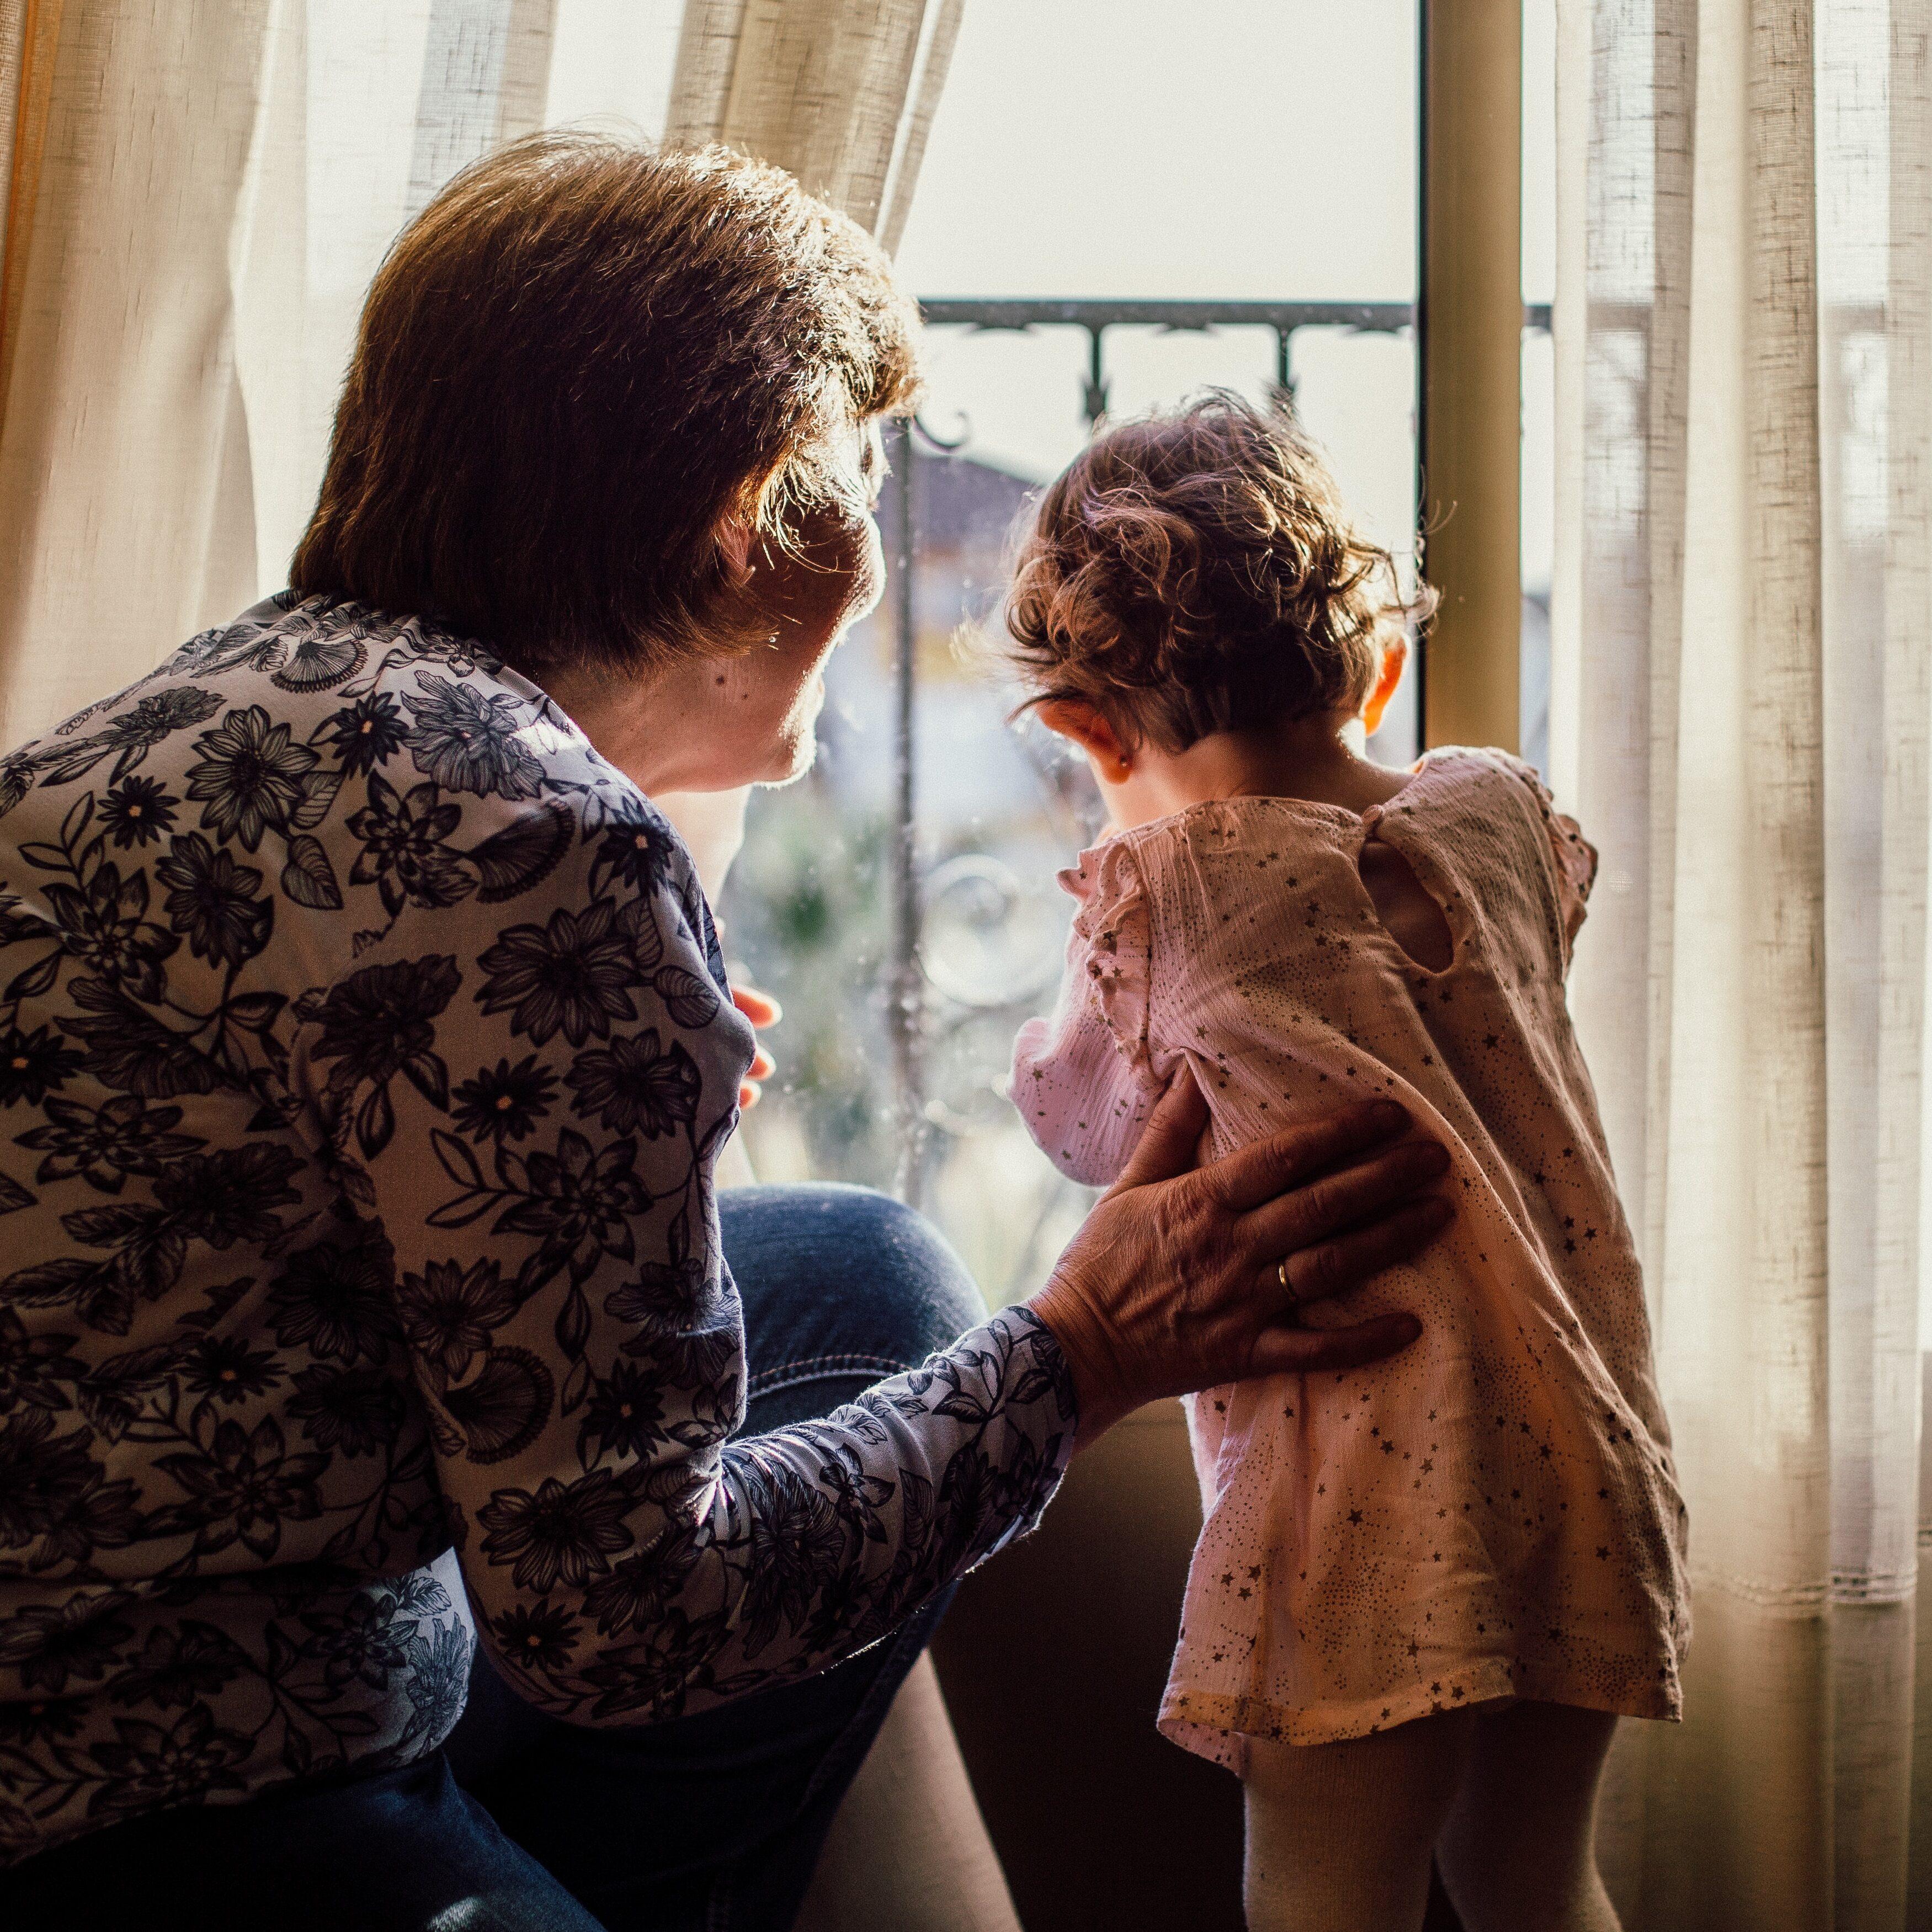 woman-holding-baby-near-window-1109238